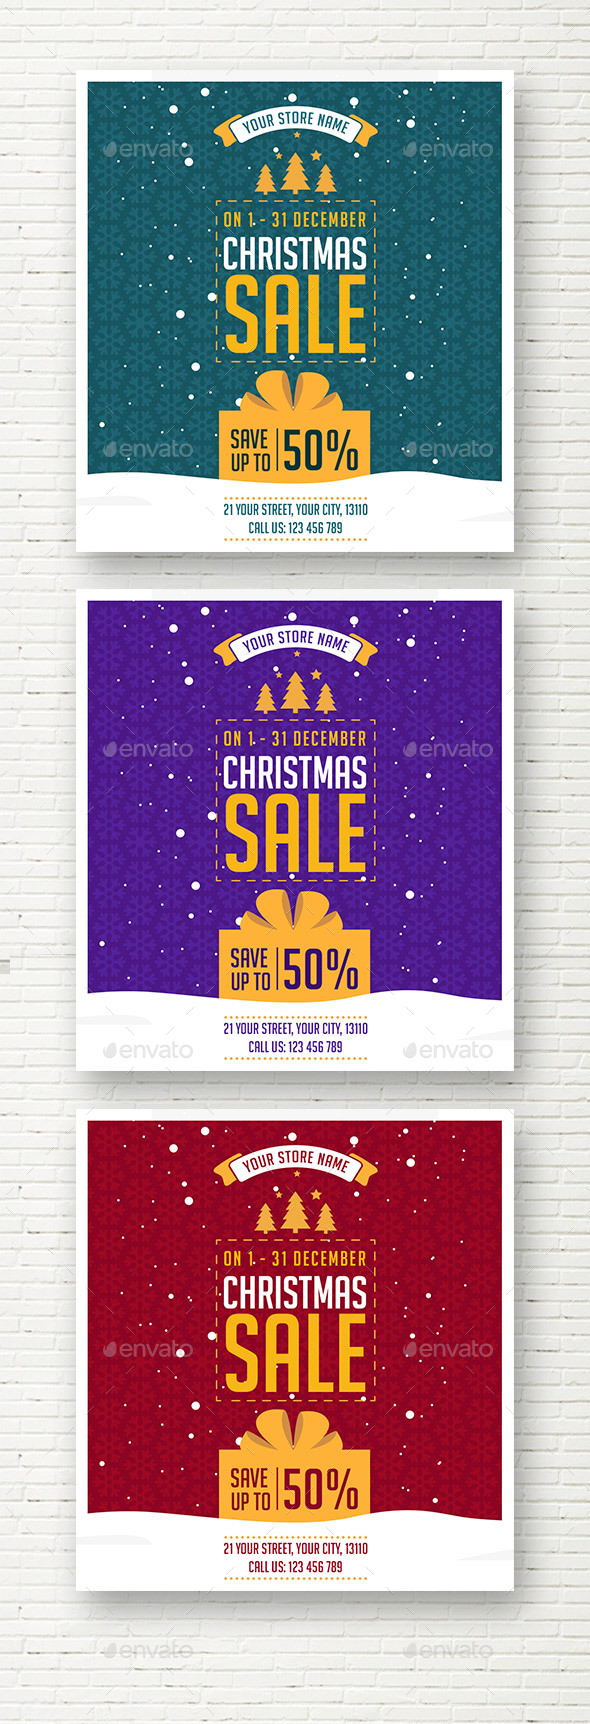 Christmas Sale Social Media Banner